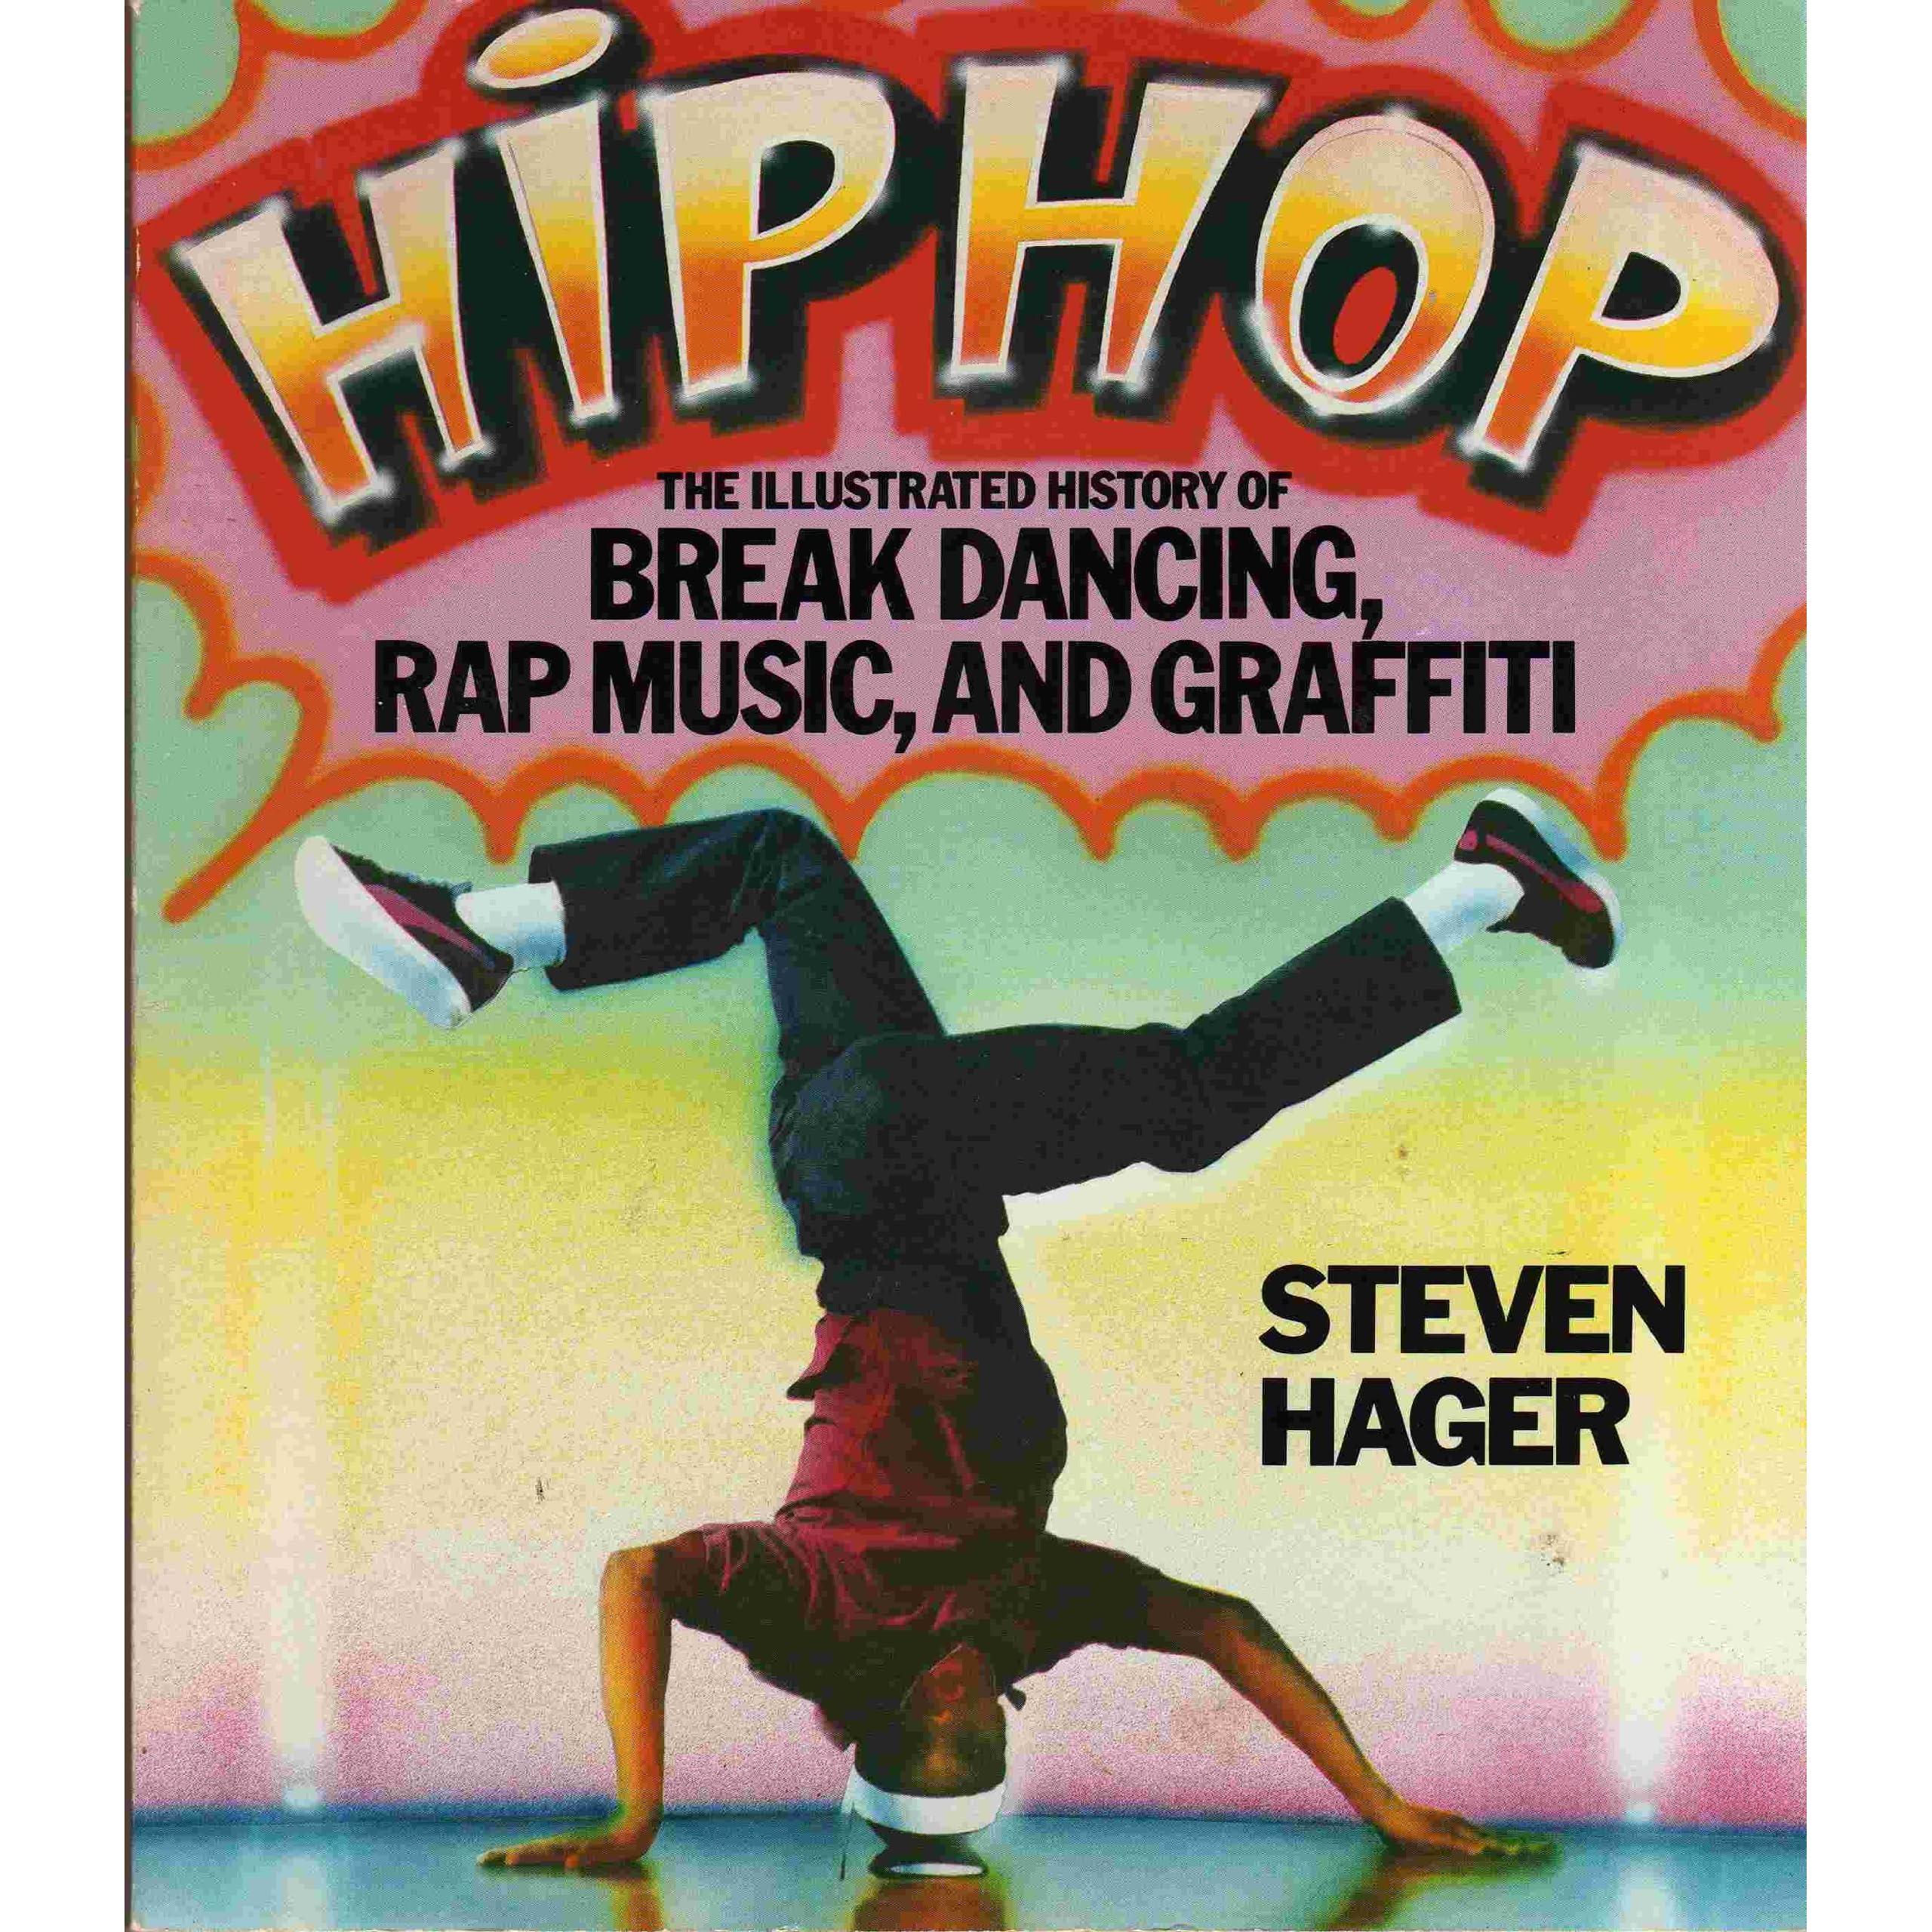 Hip Hop: The Illustrated History of Break Dancing, Rap Music